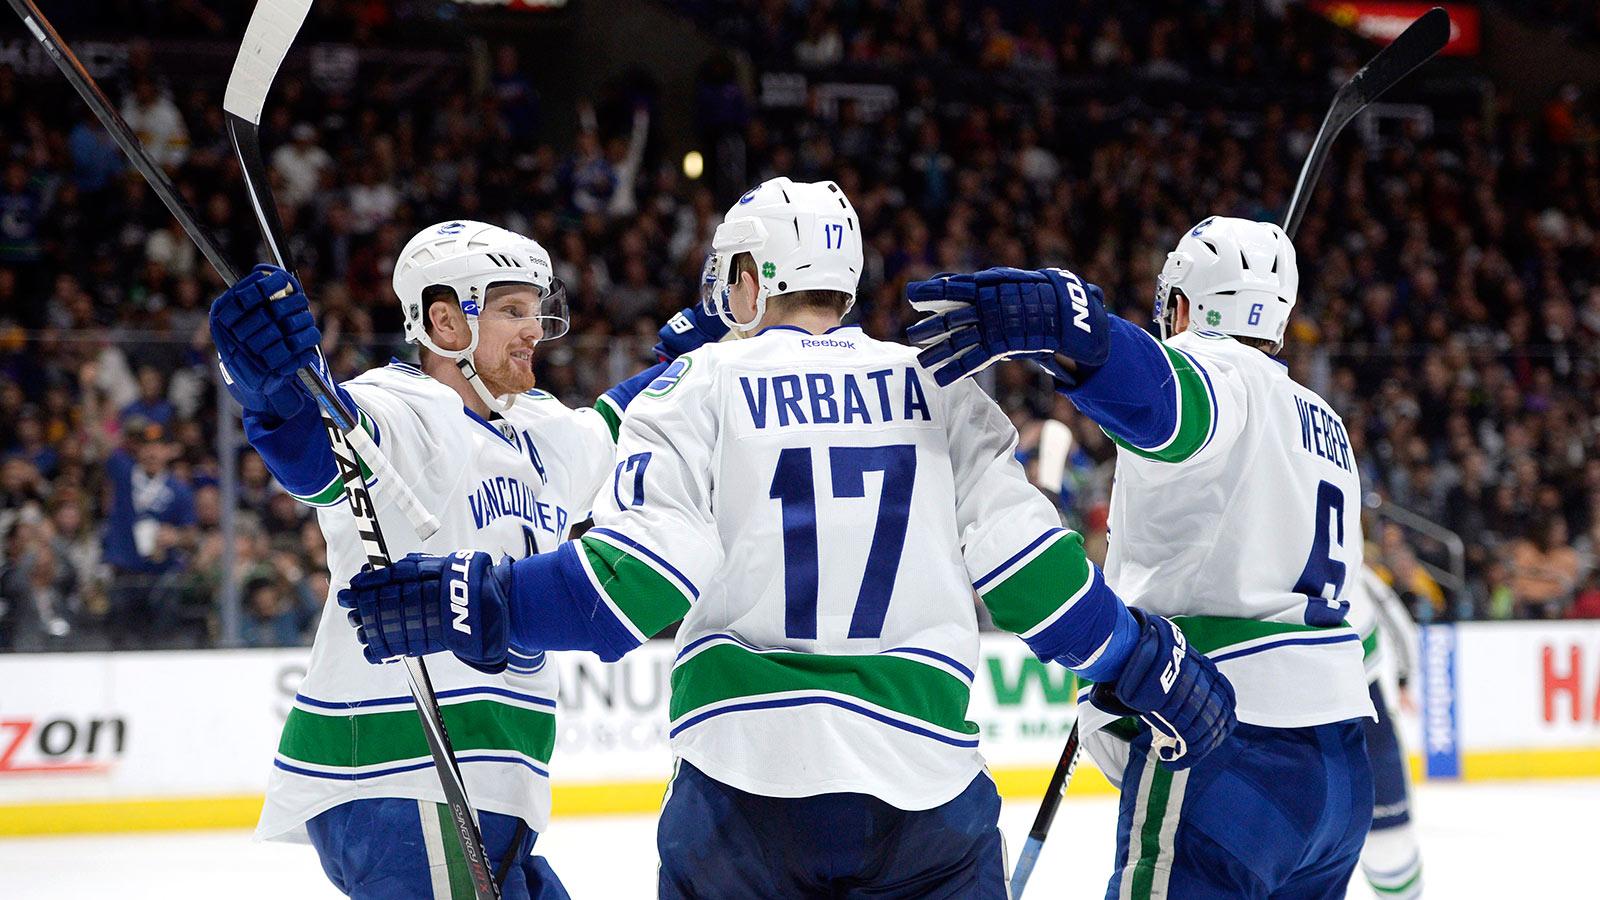 Trade deadline outlook: Vancouver Canucks